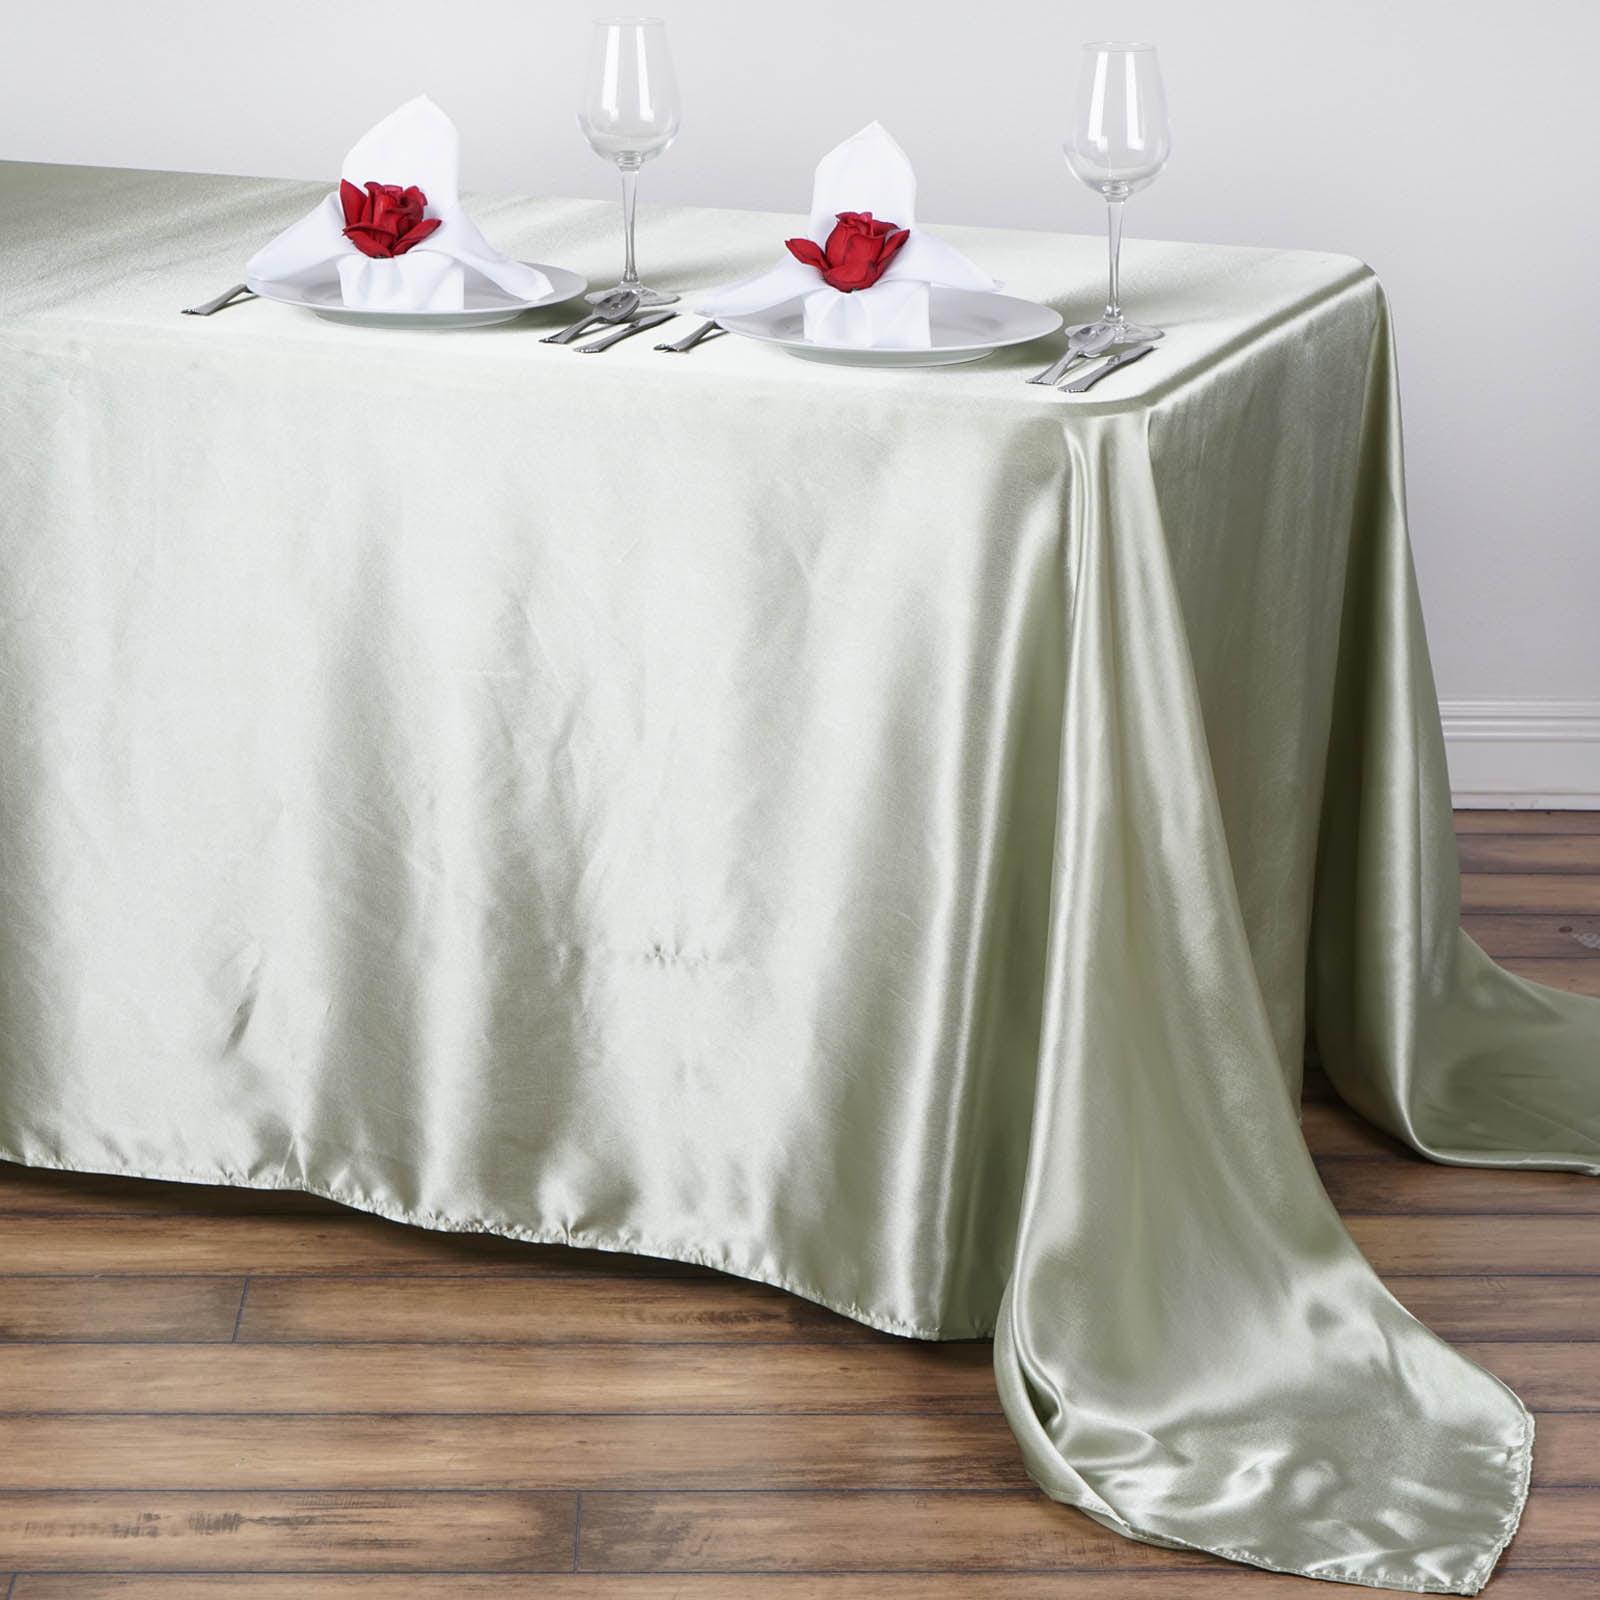 "BalsaCircle 90"" x 132"" Rectangular Satin Tablecloth Table Covers for Party... by BalsaCircle"